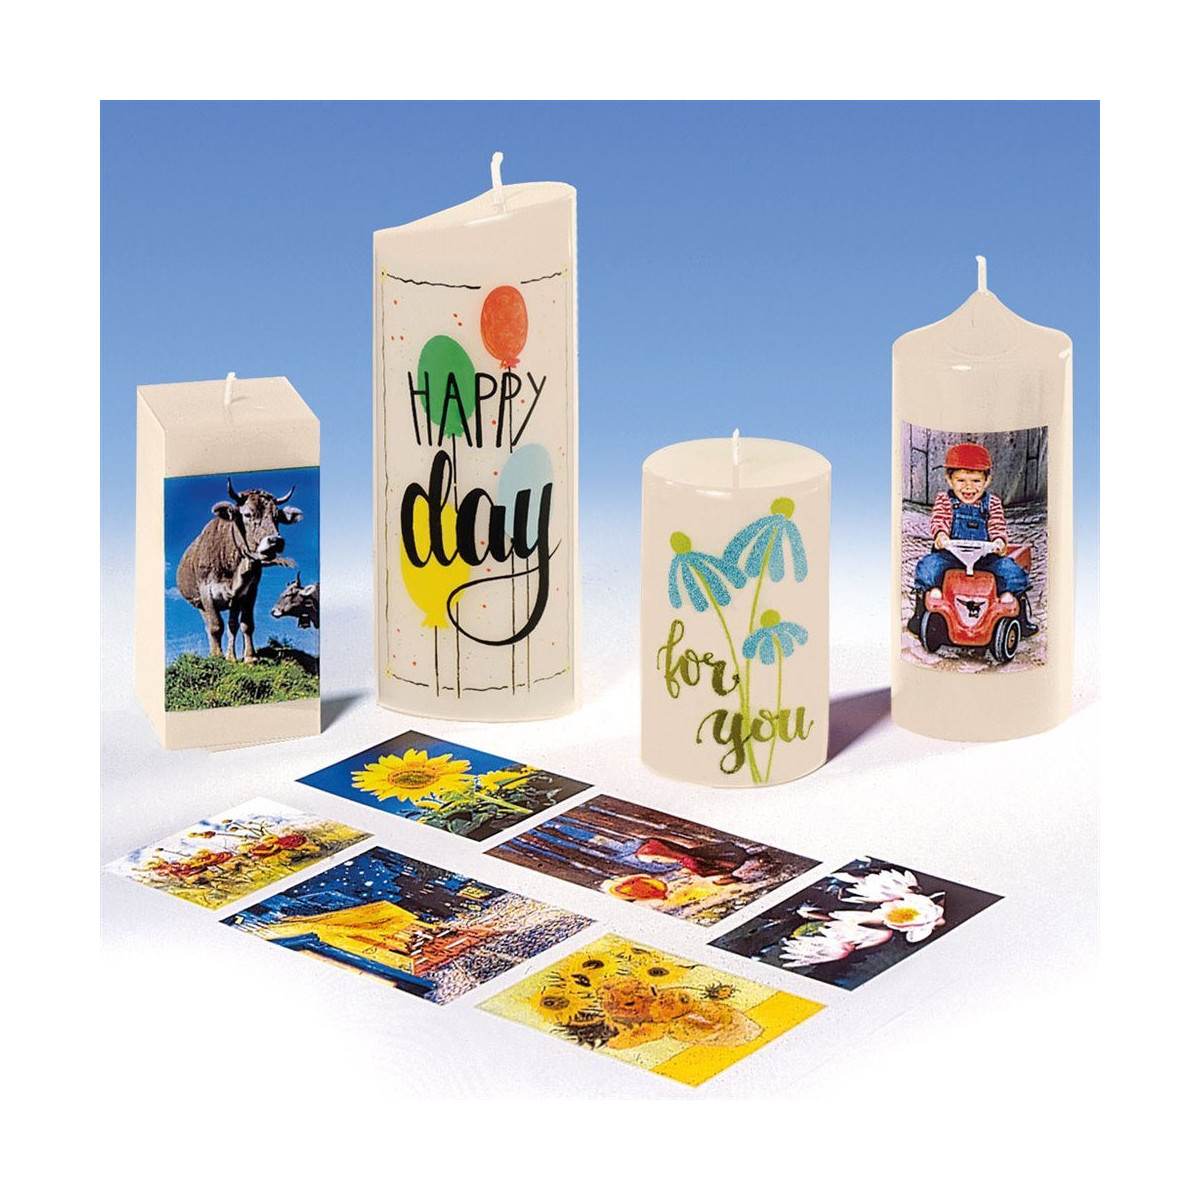 Papier de transfert de photos pour bougies